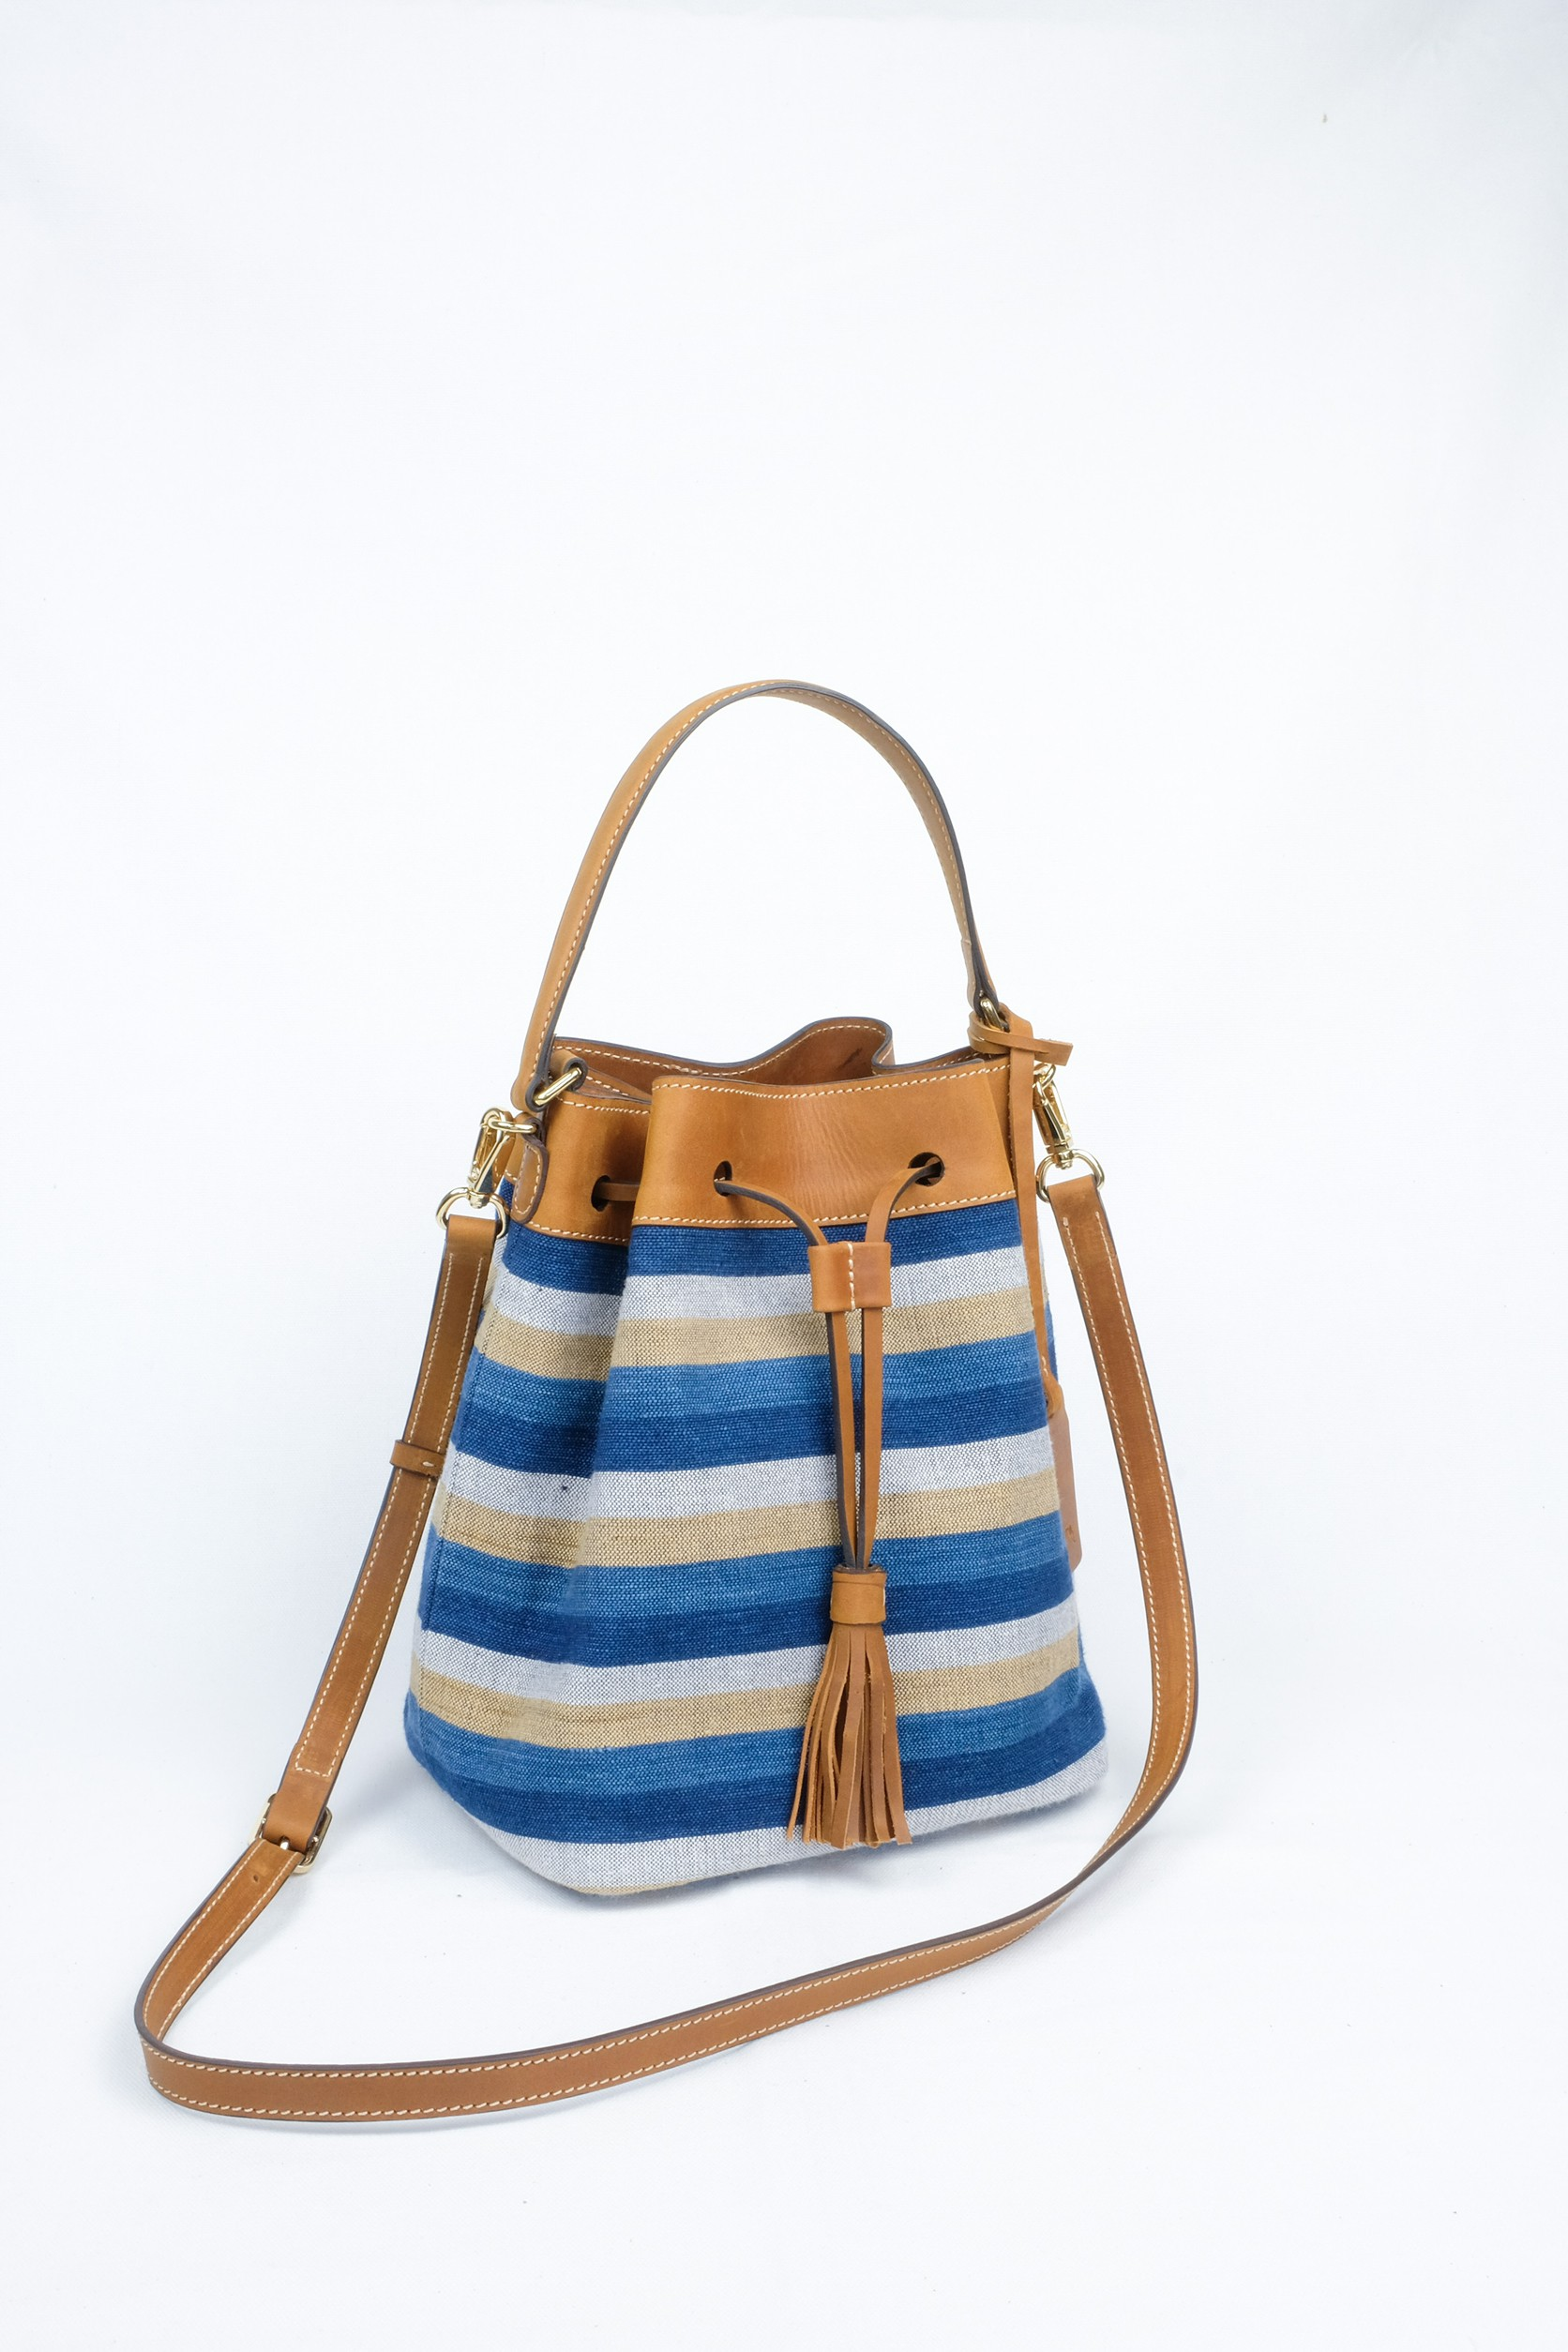 Little Sensee bag